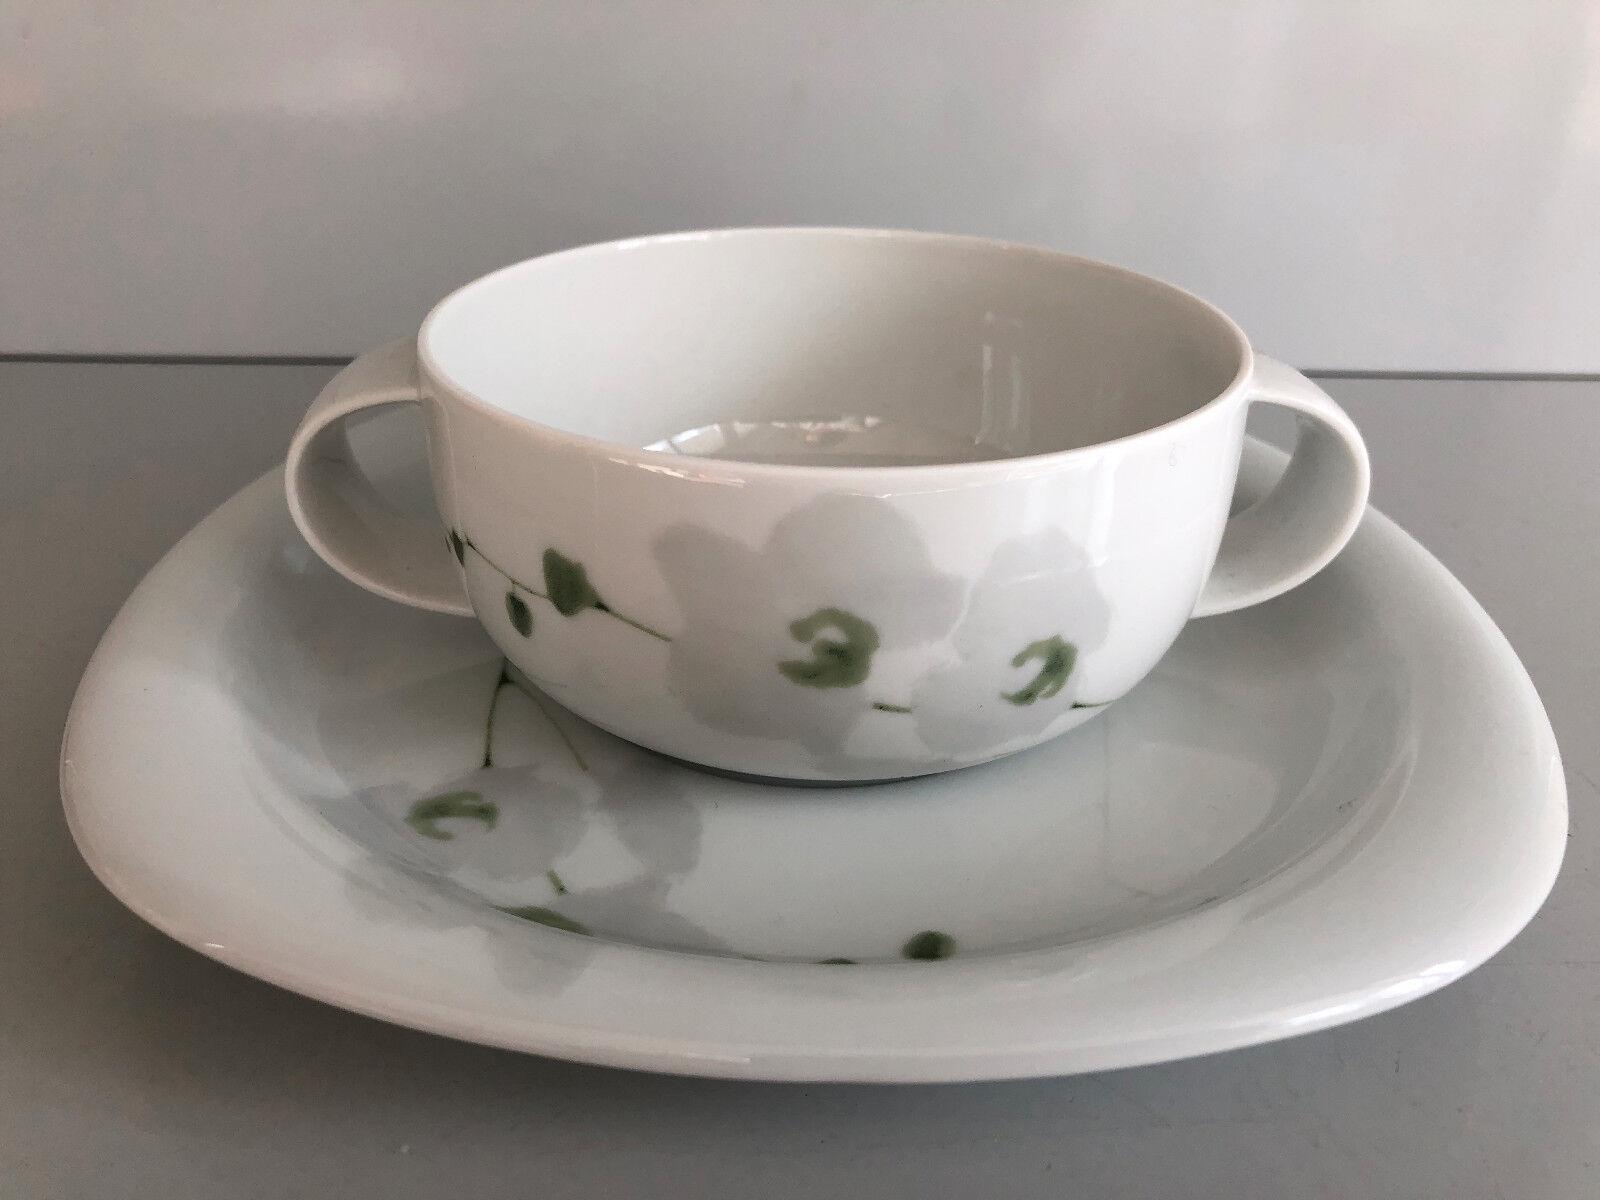 Rosanthal SUOMI Rangoon SUPPENTASSE & UNTERTASSE unbenutzt Soup Soup Soup Cup & Saucer bf9ac8